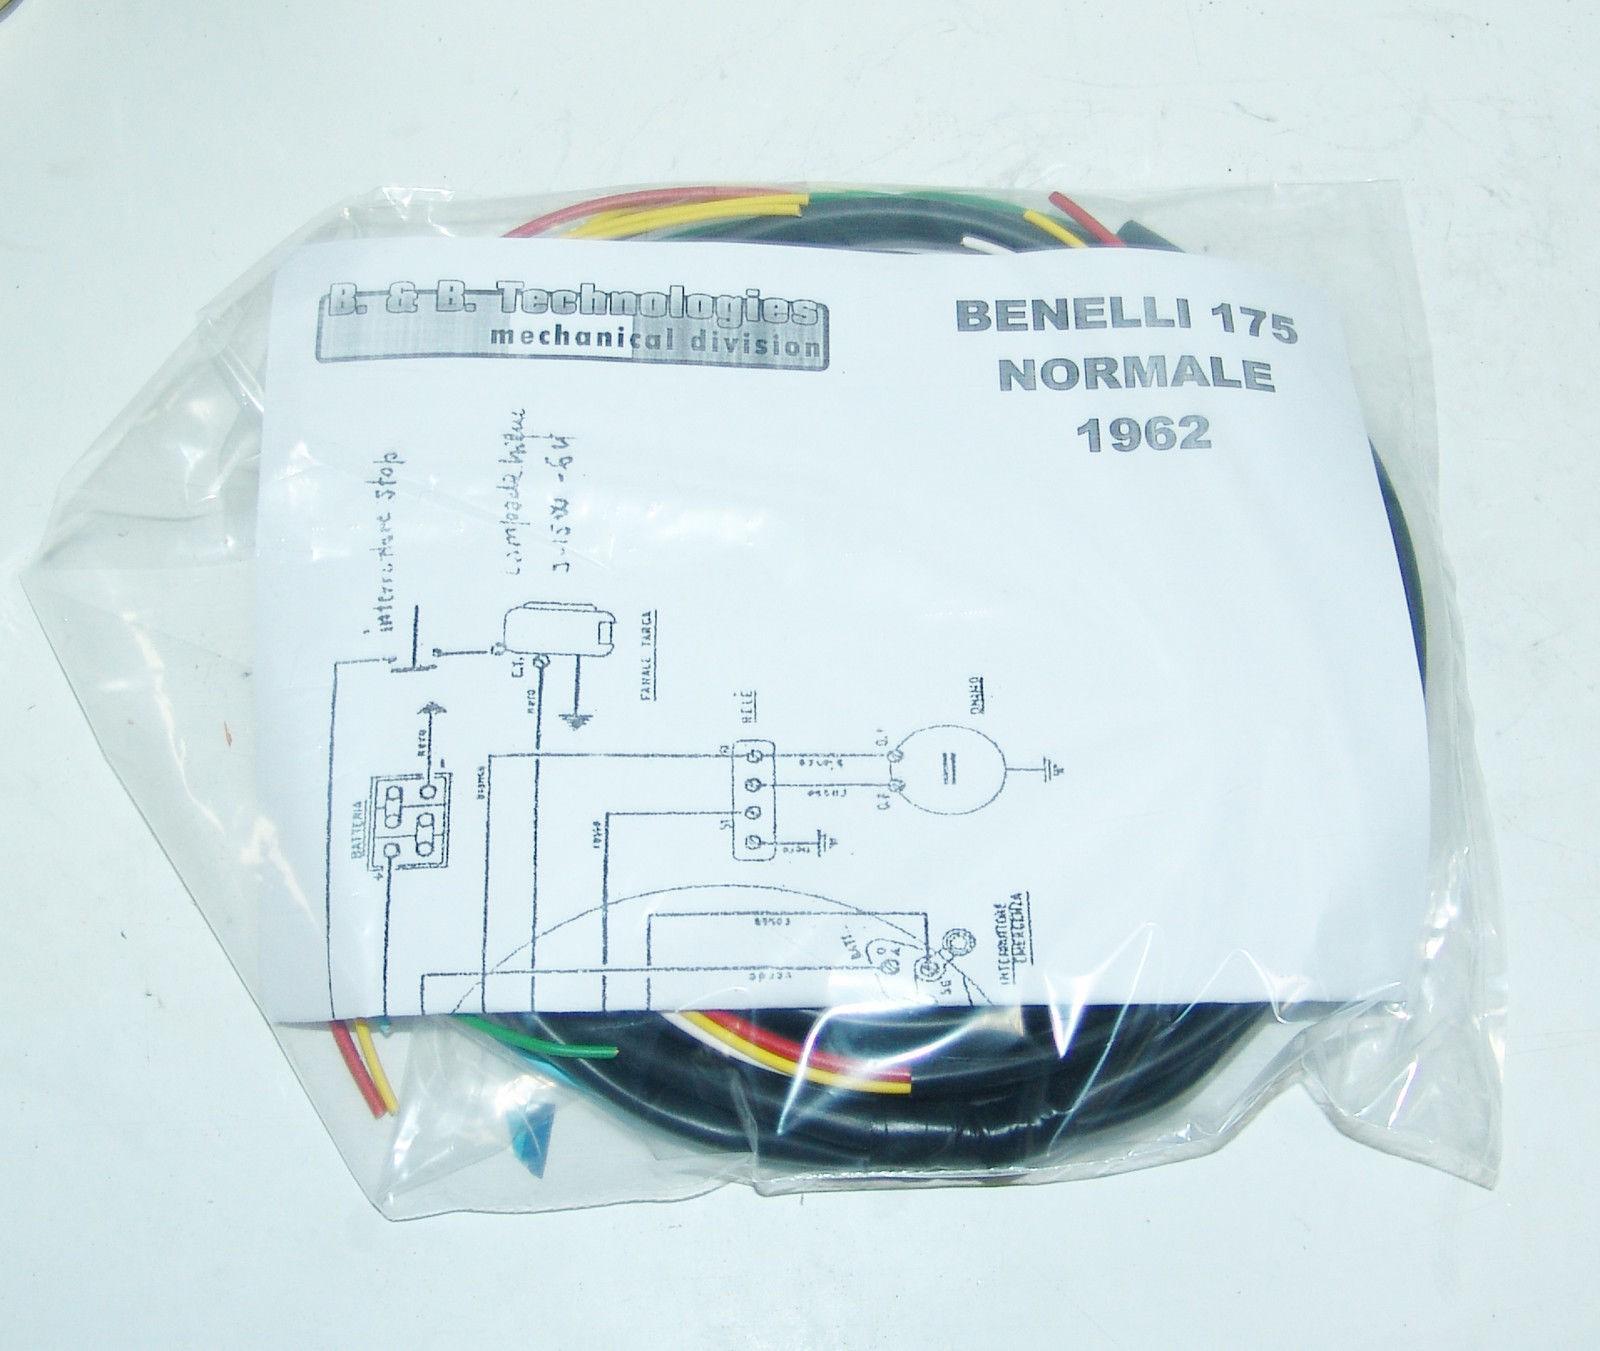 Schema Elettrico Wiring Diagram : Impianti elettrici moto impianto elettrico electrical wiring